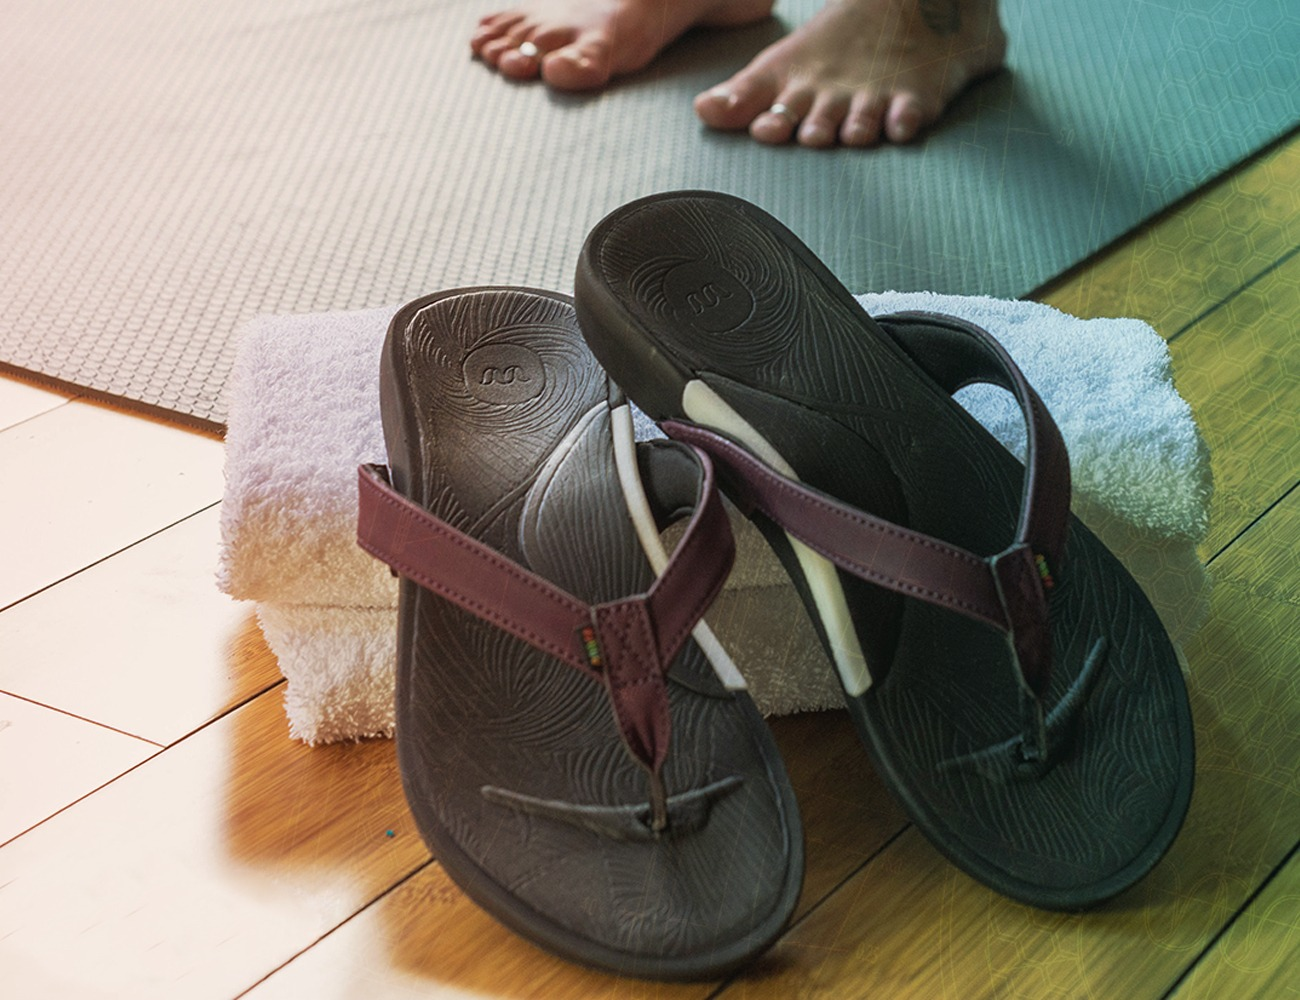 Wiivv Custom Fit 3D Printed Sandals